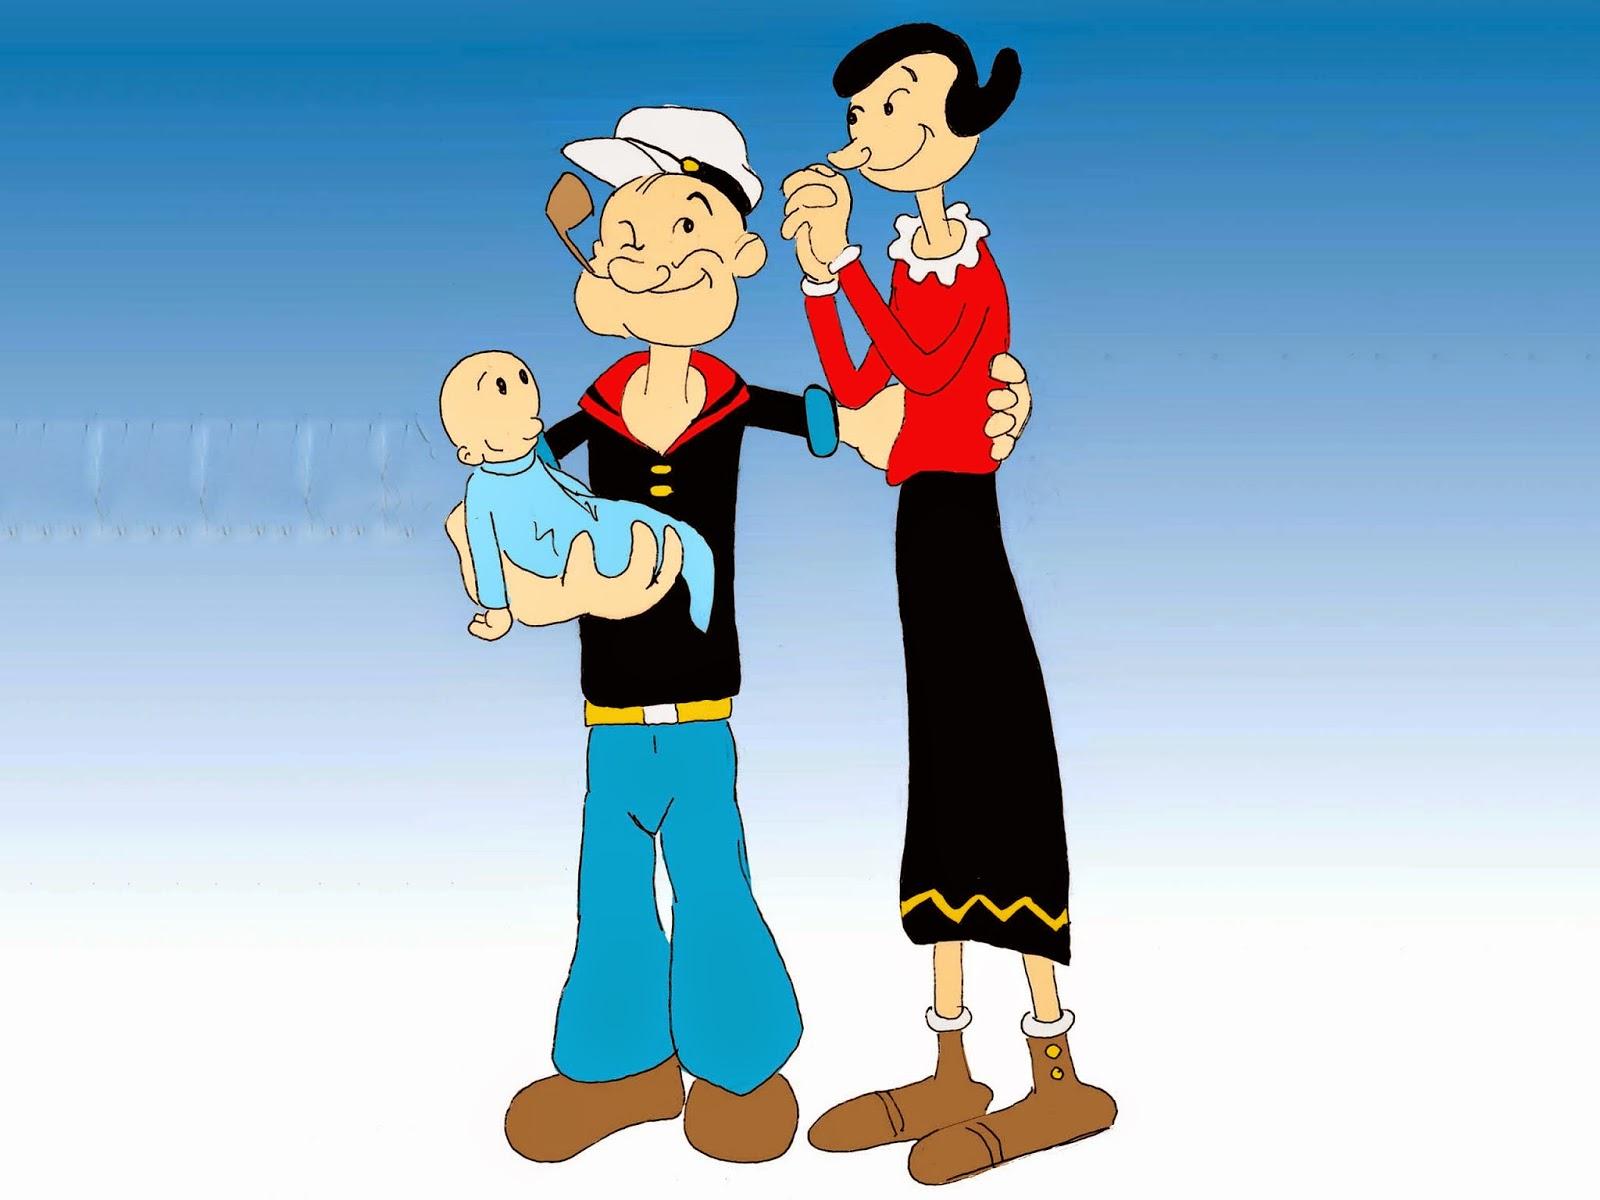 Wallpaper Popeye The Sailor